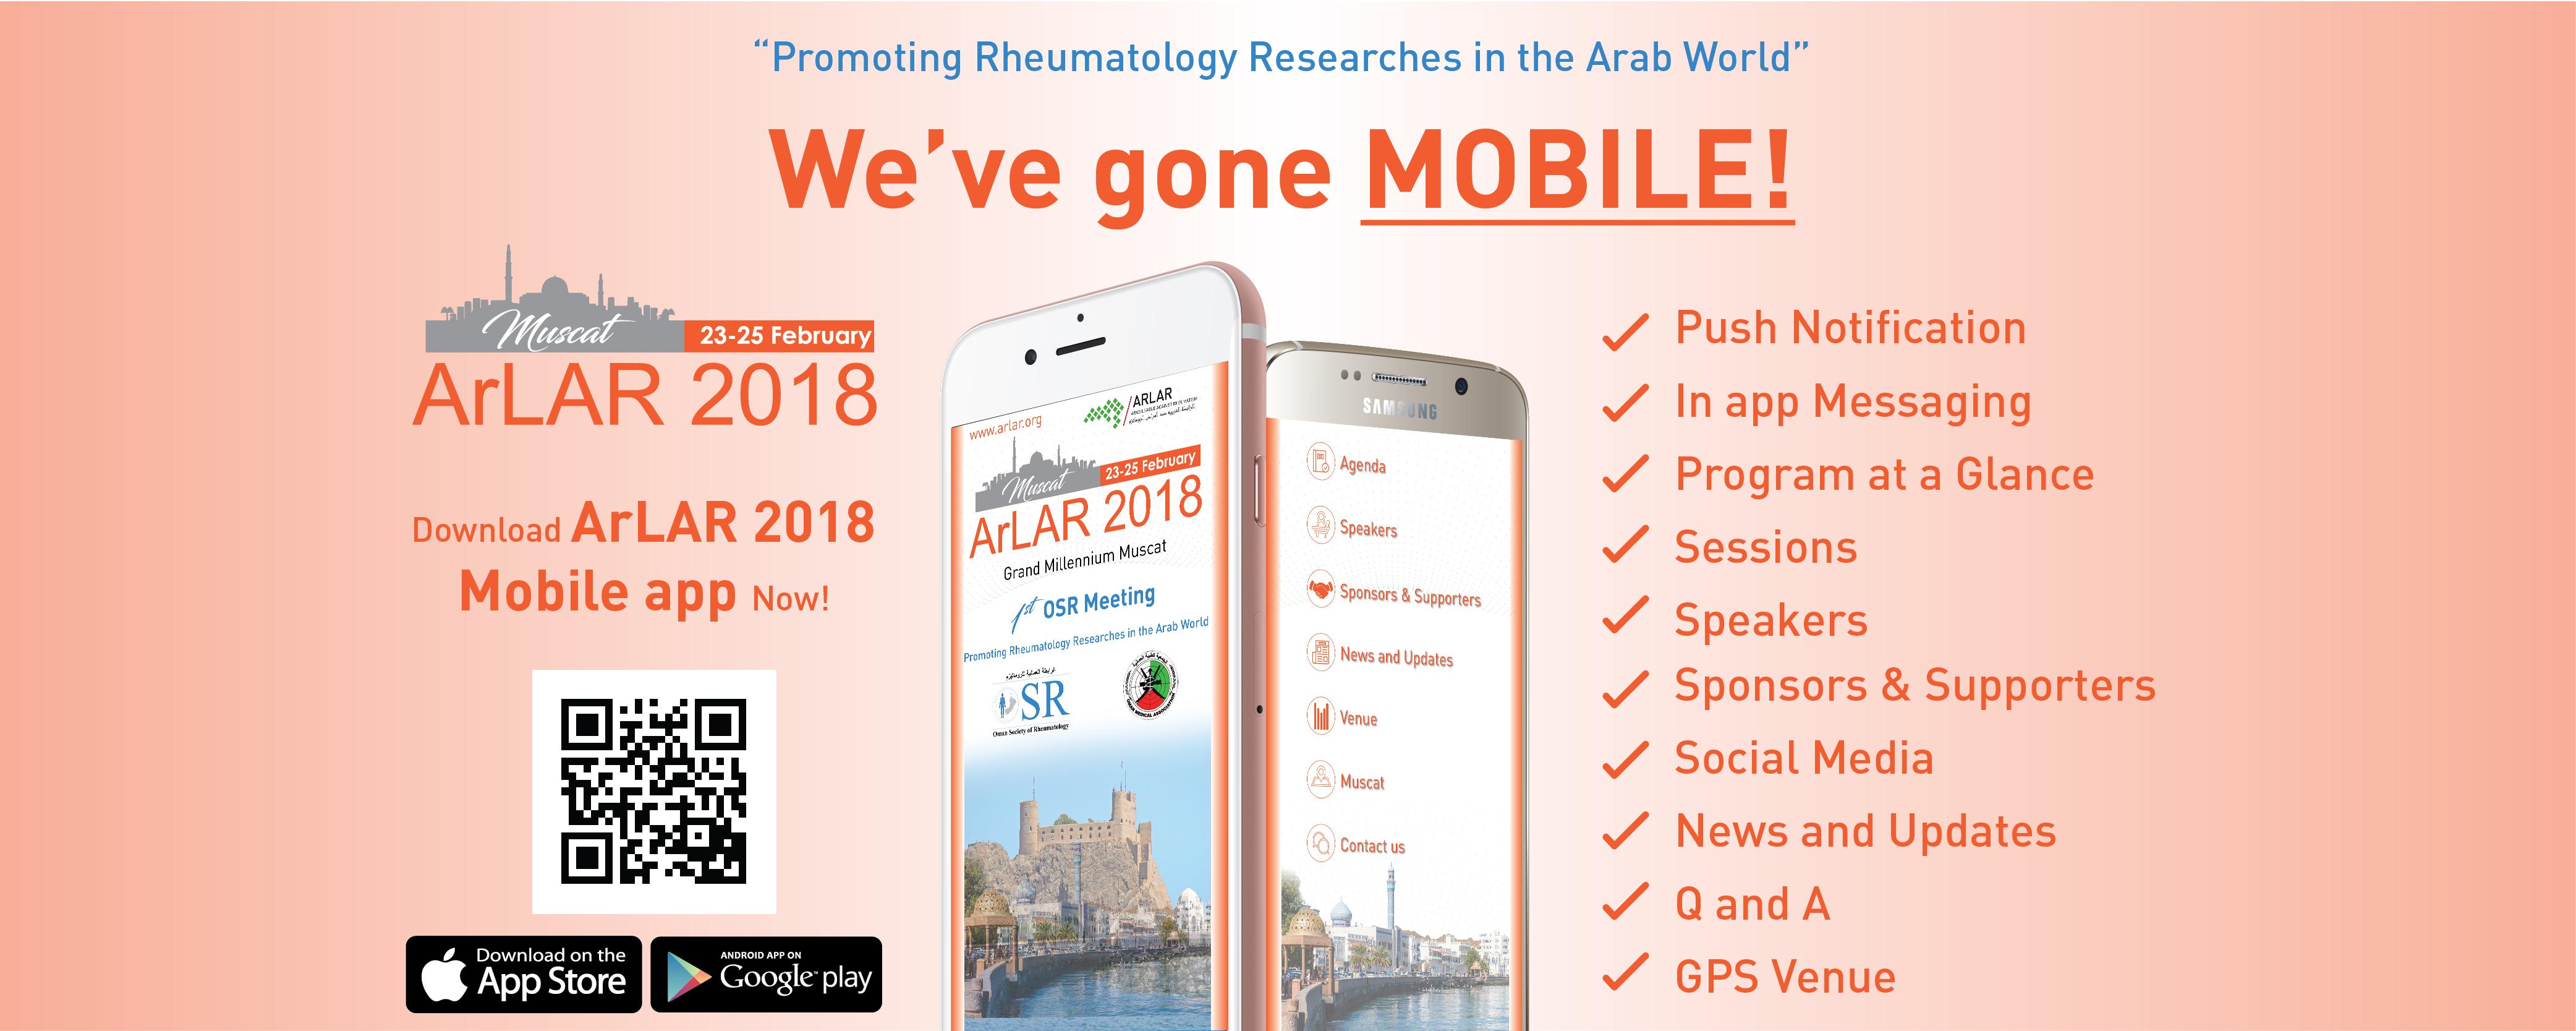 BANNER-ARLAR-2018_mobile-app